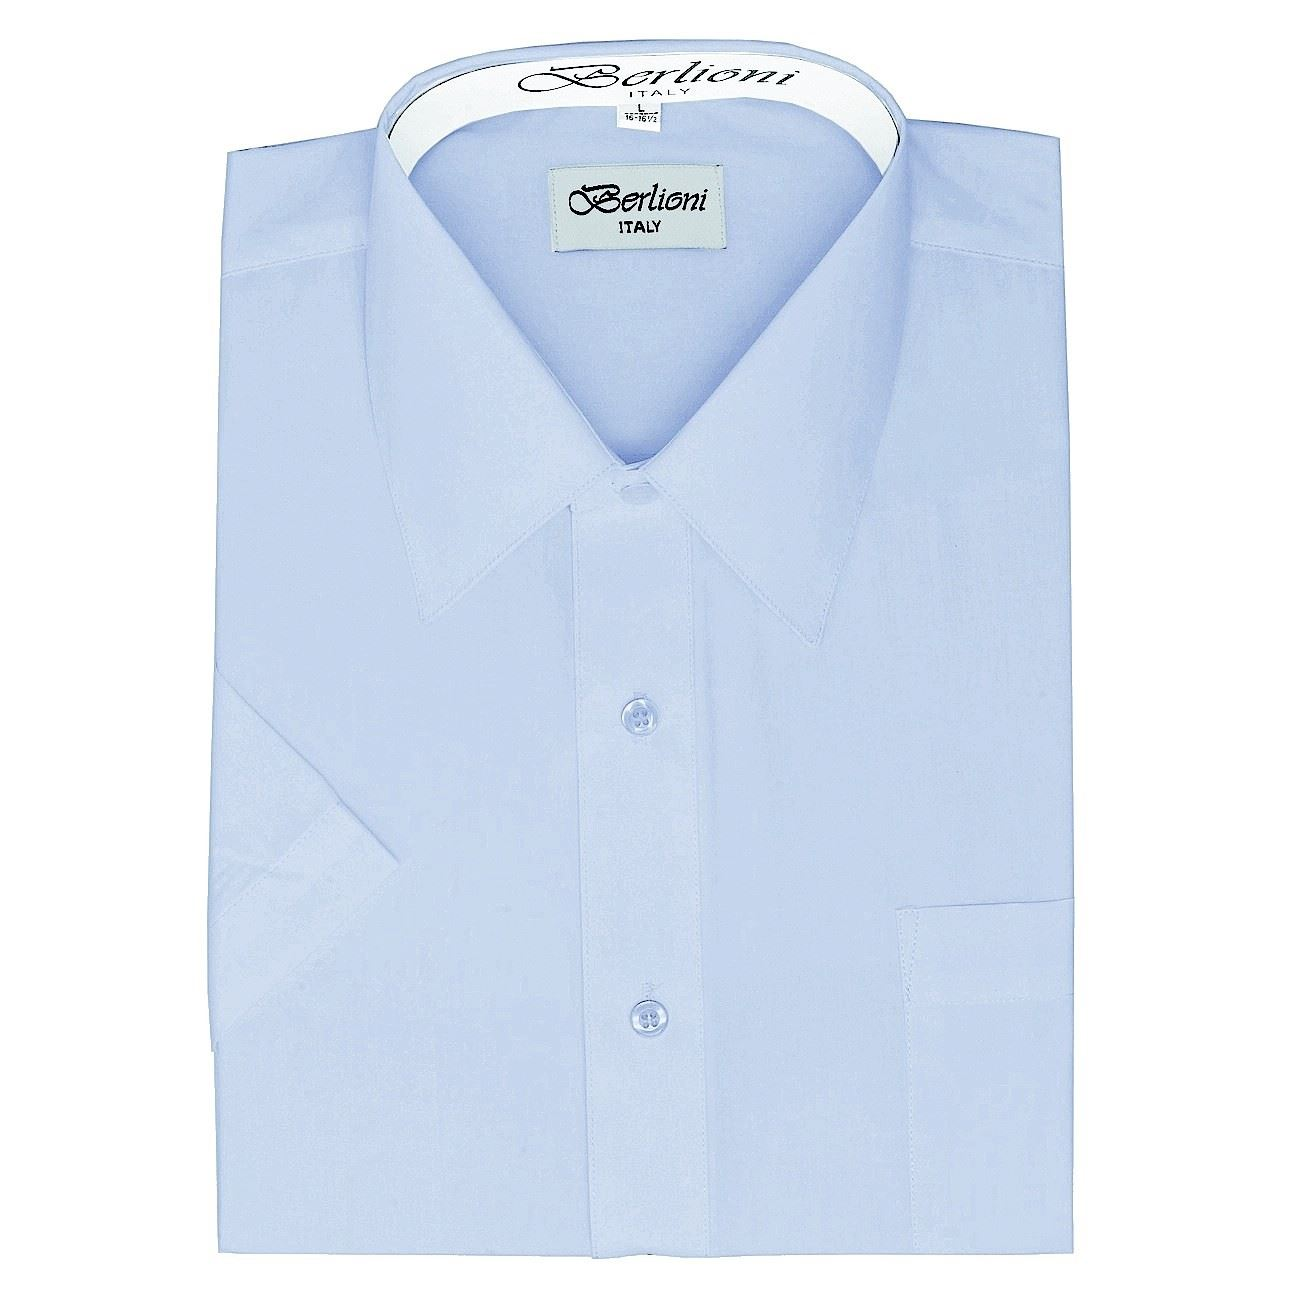 berlioni men 39 s dress shirt basic short sleeve button down